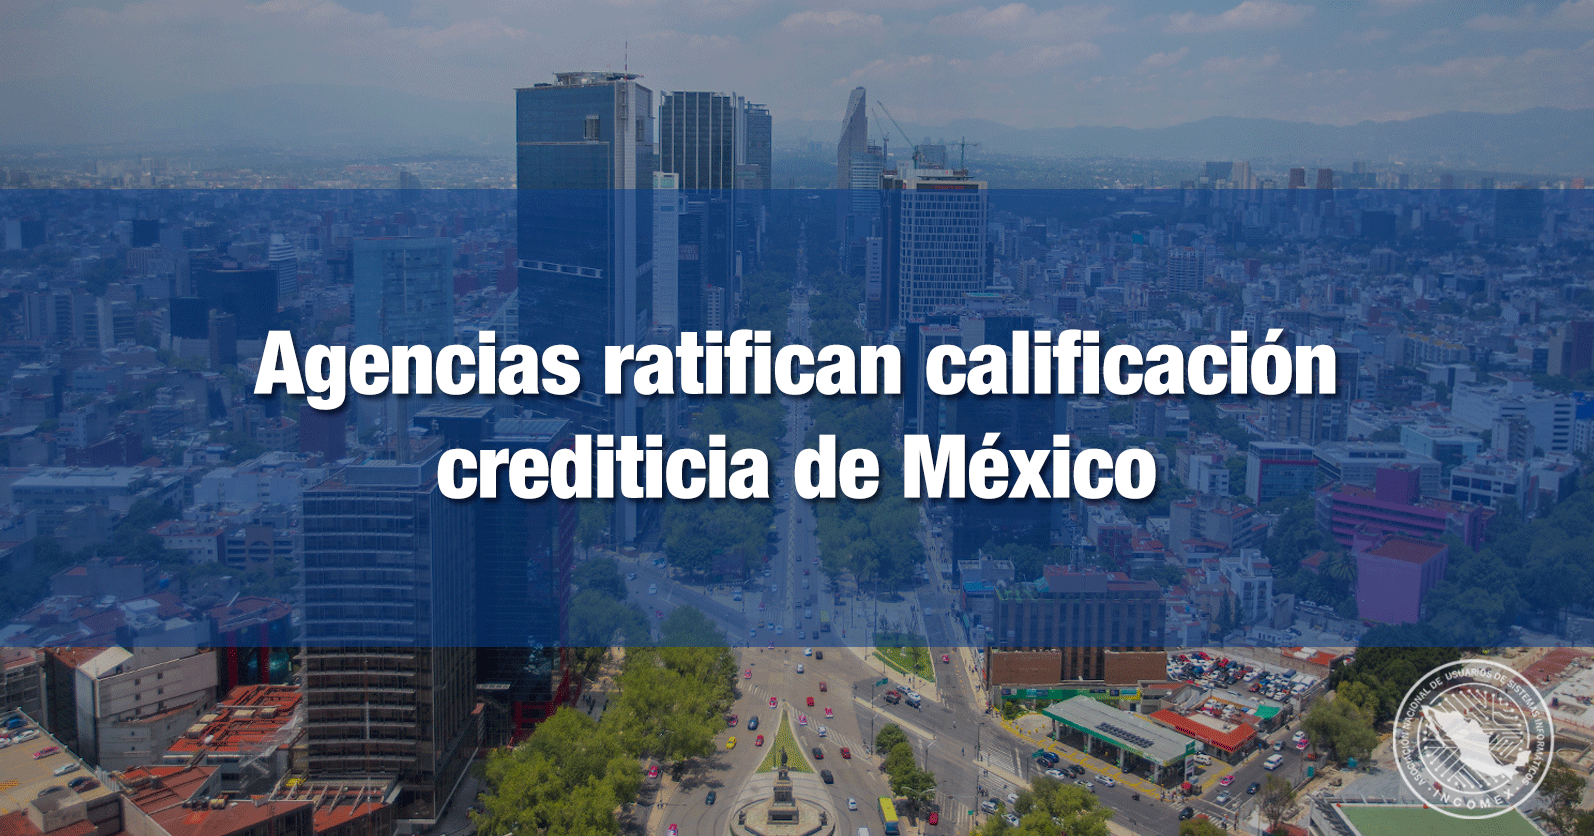 Agencias ratifican calificación crediticia de México